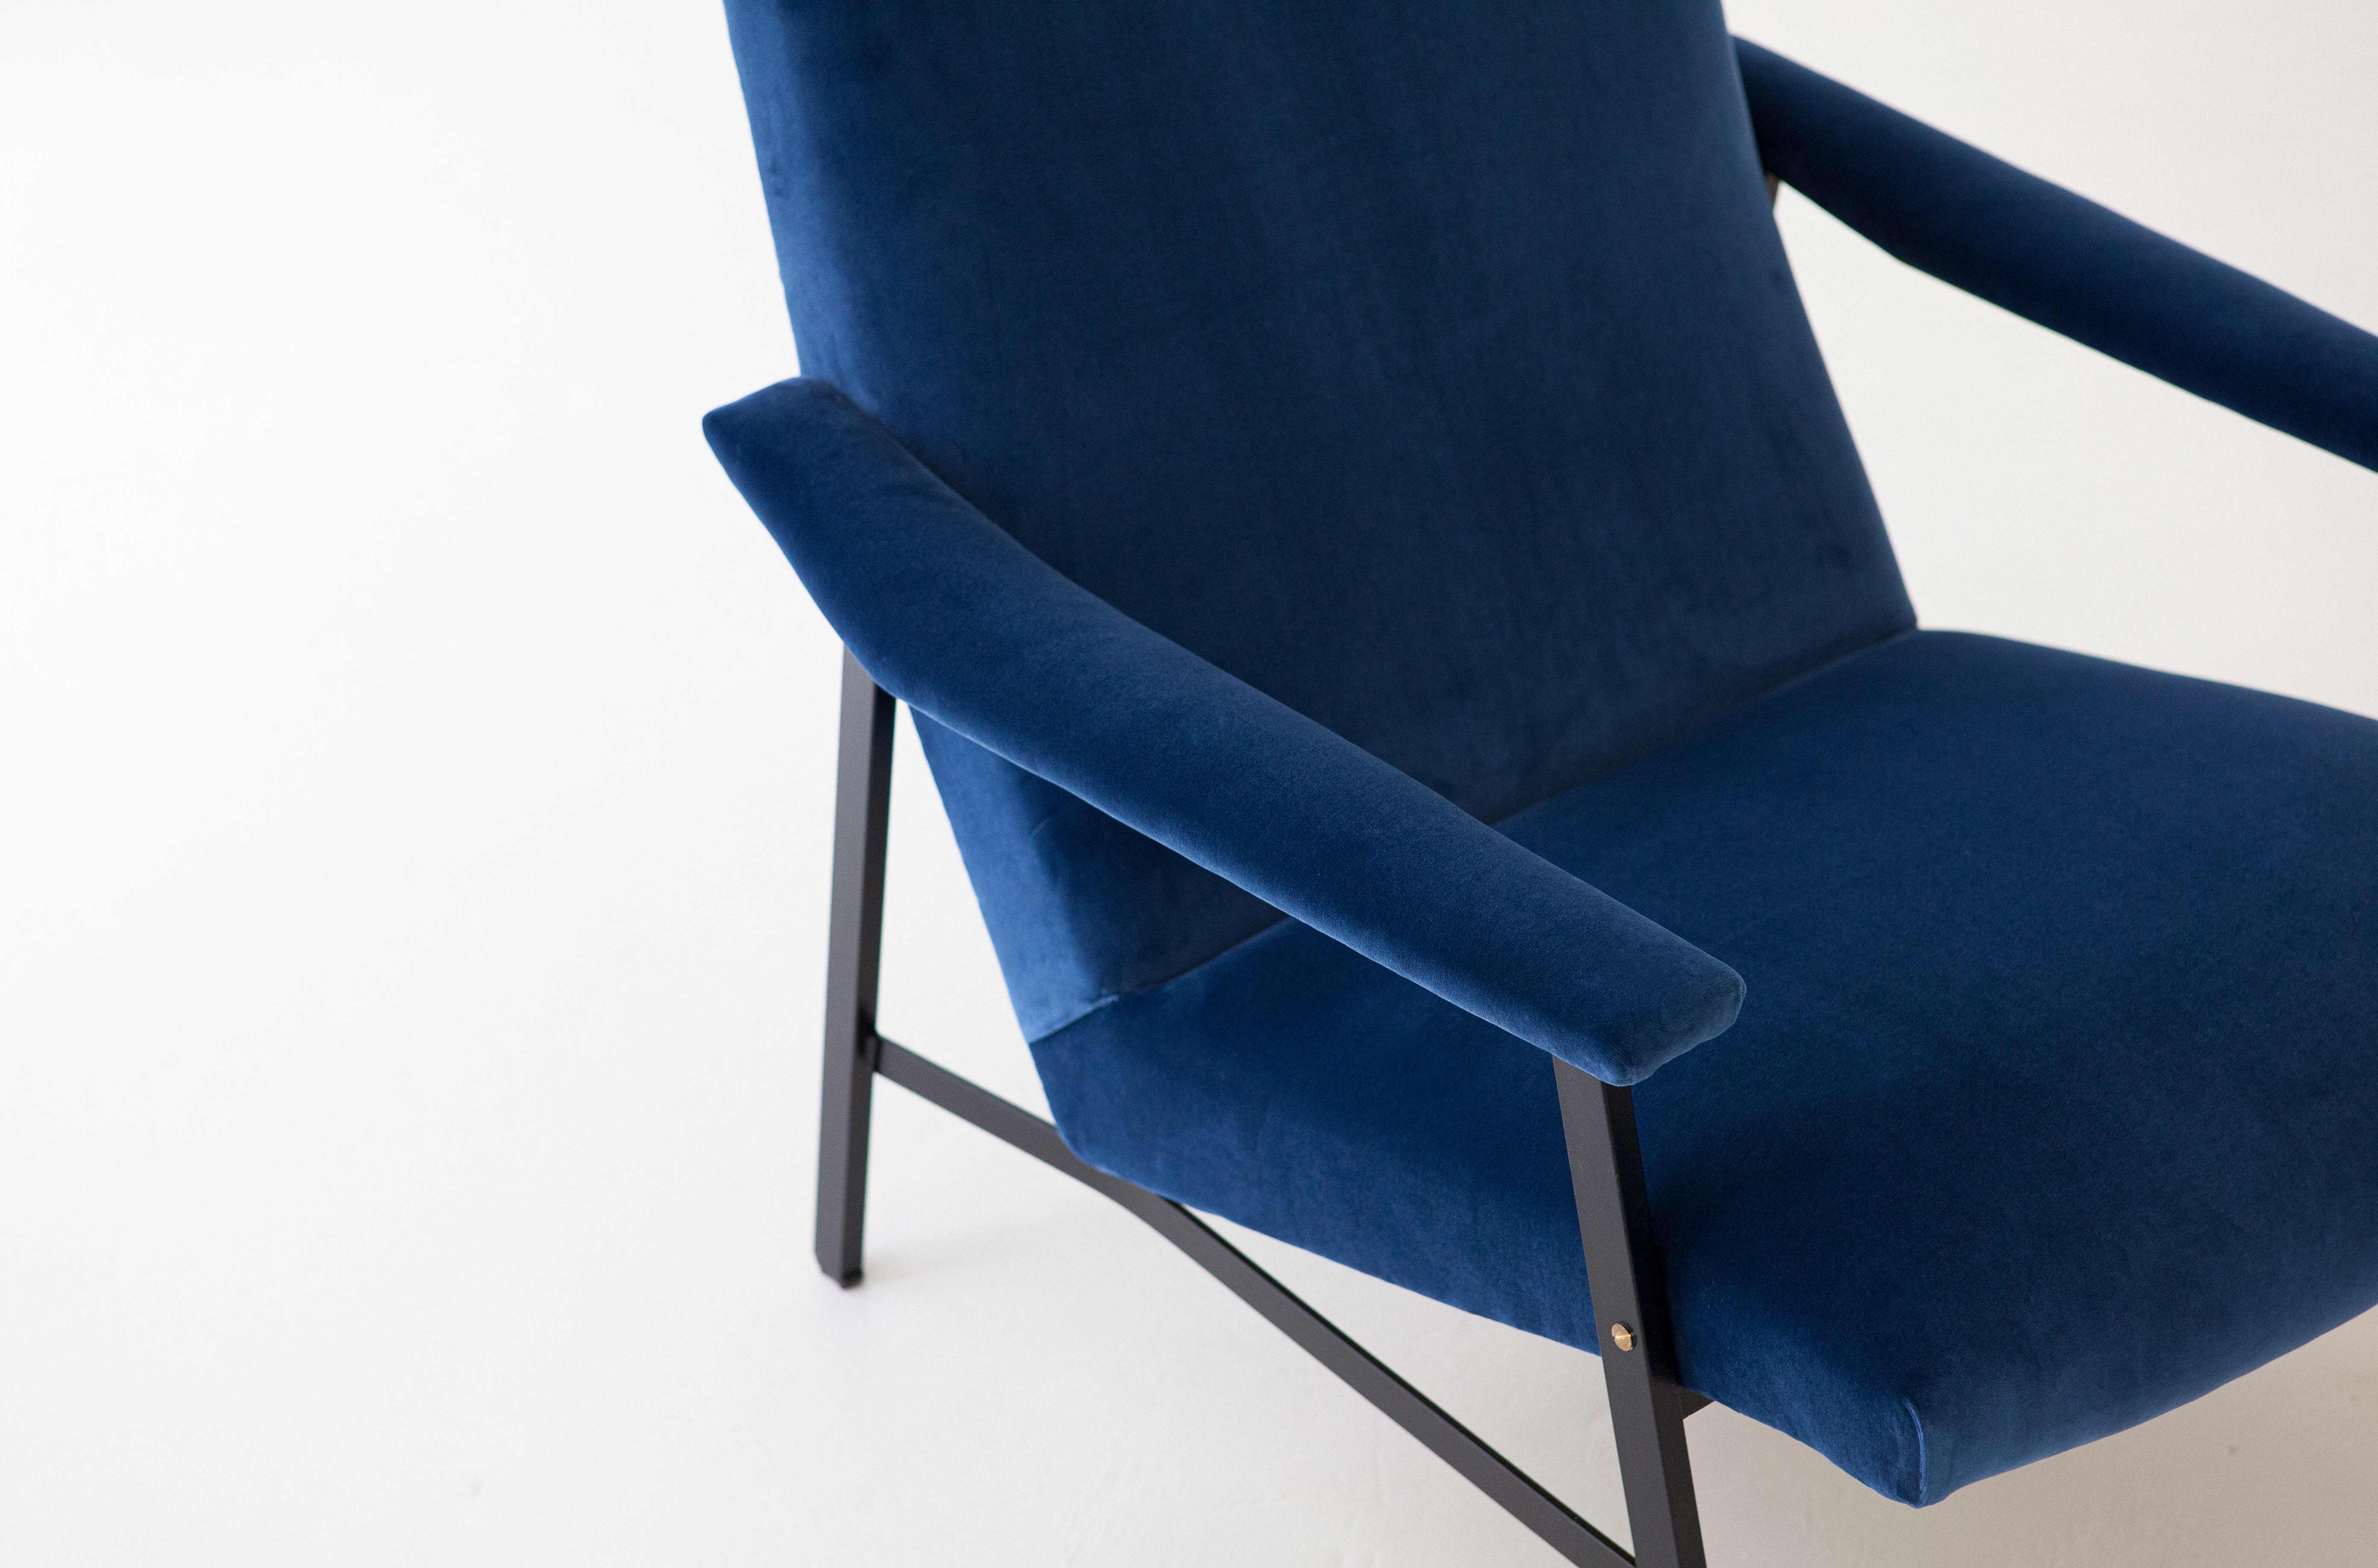 1950s-Italian-blu-velvet-lounge-armchair-10-SE295